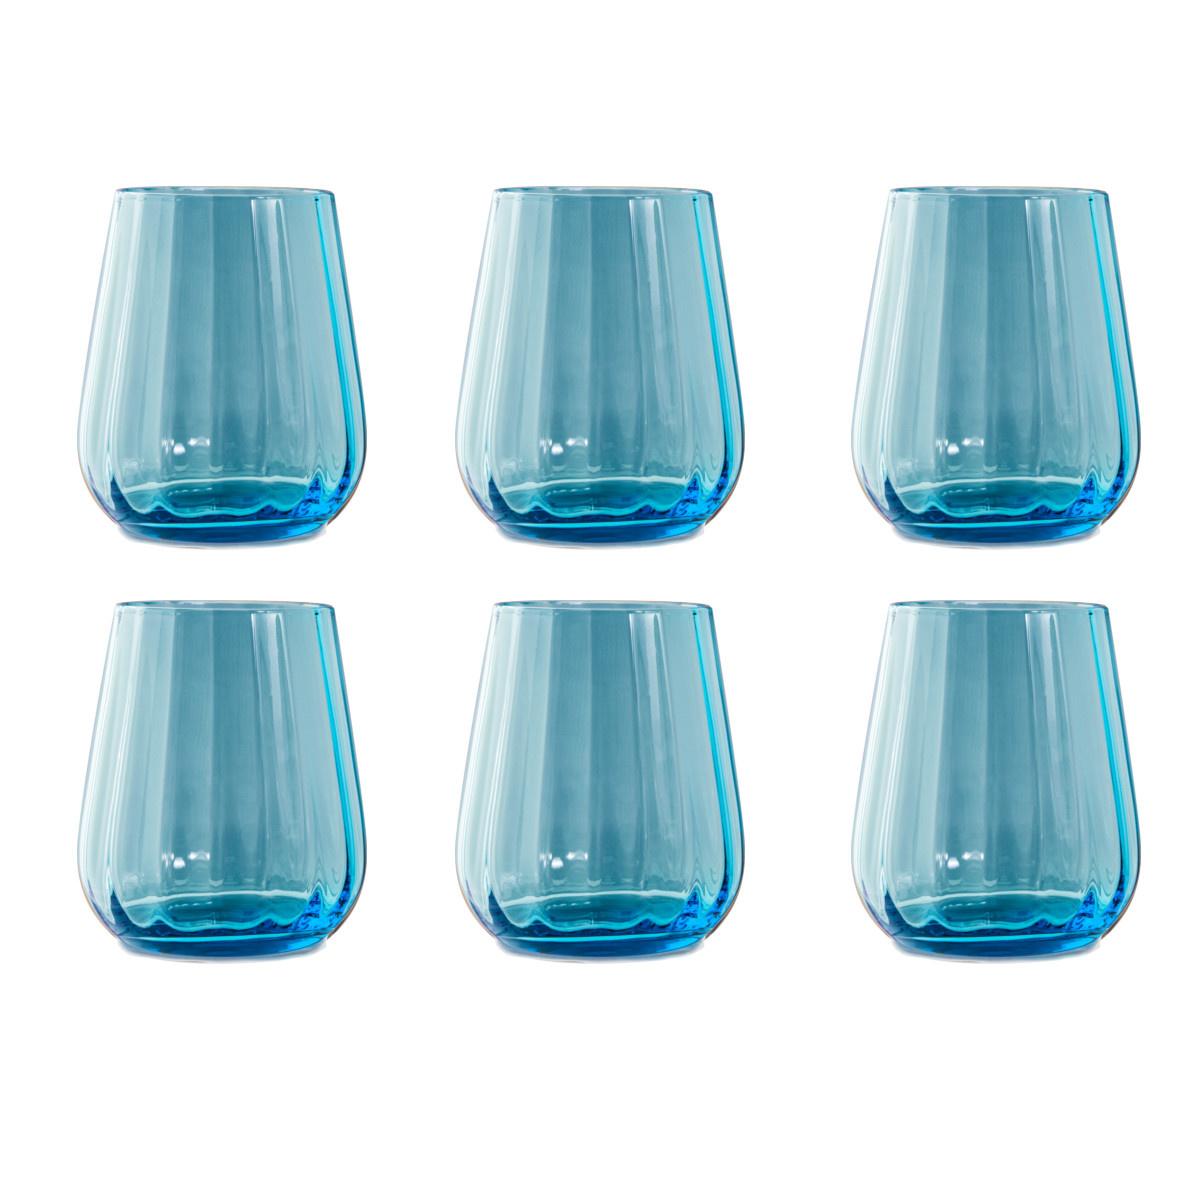 Livellara Livellara RINASCIMENTO  Glas / Tumbler 400 ml – Set van 6 – Kleur: Turquoise